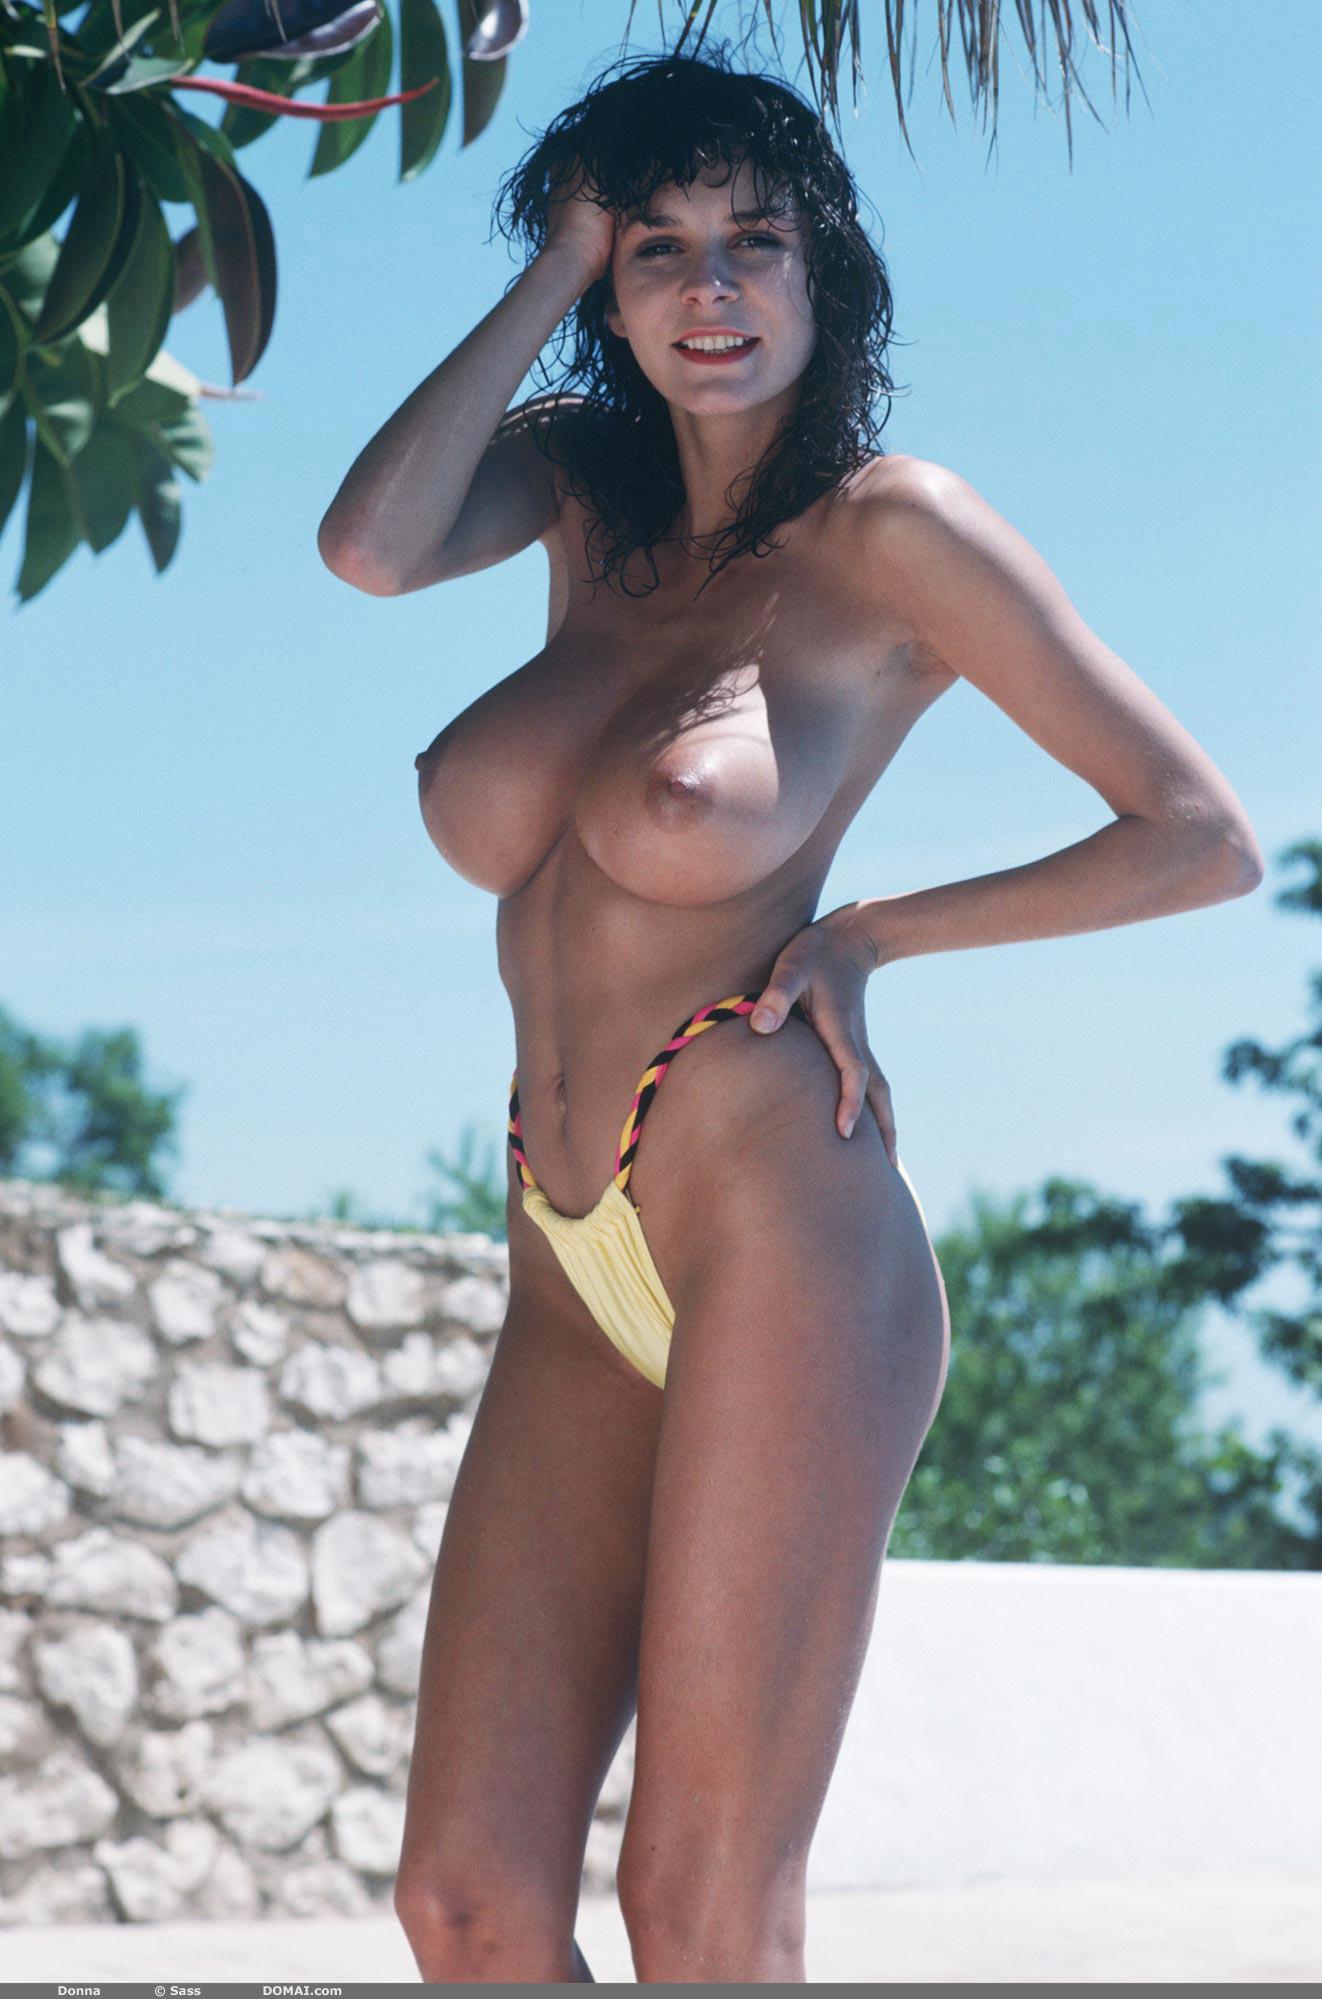 from Jon donna ewin erotic photos